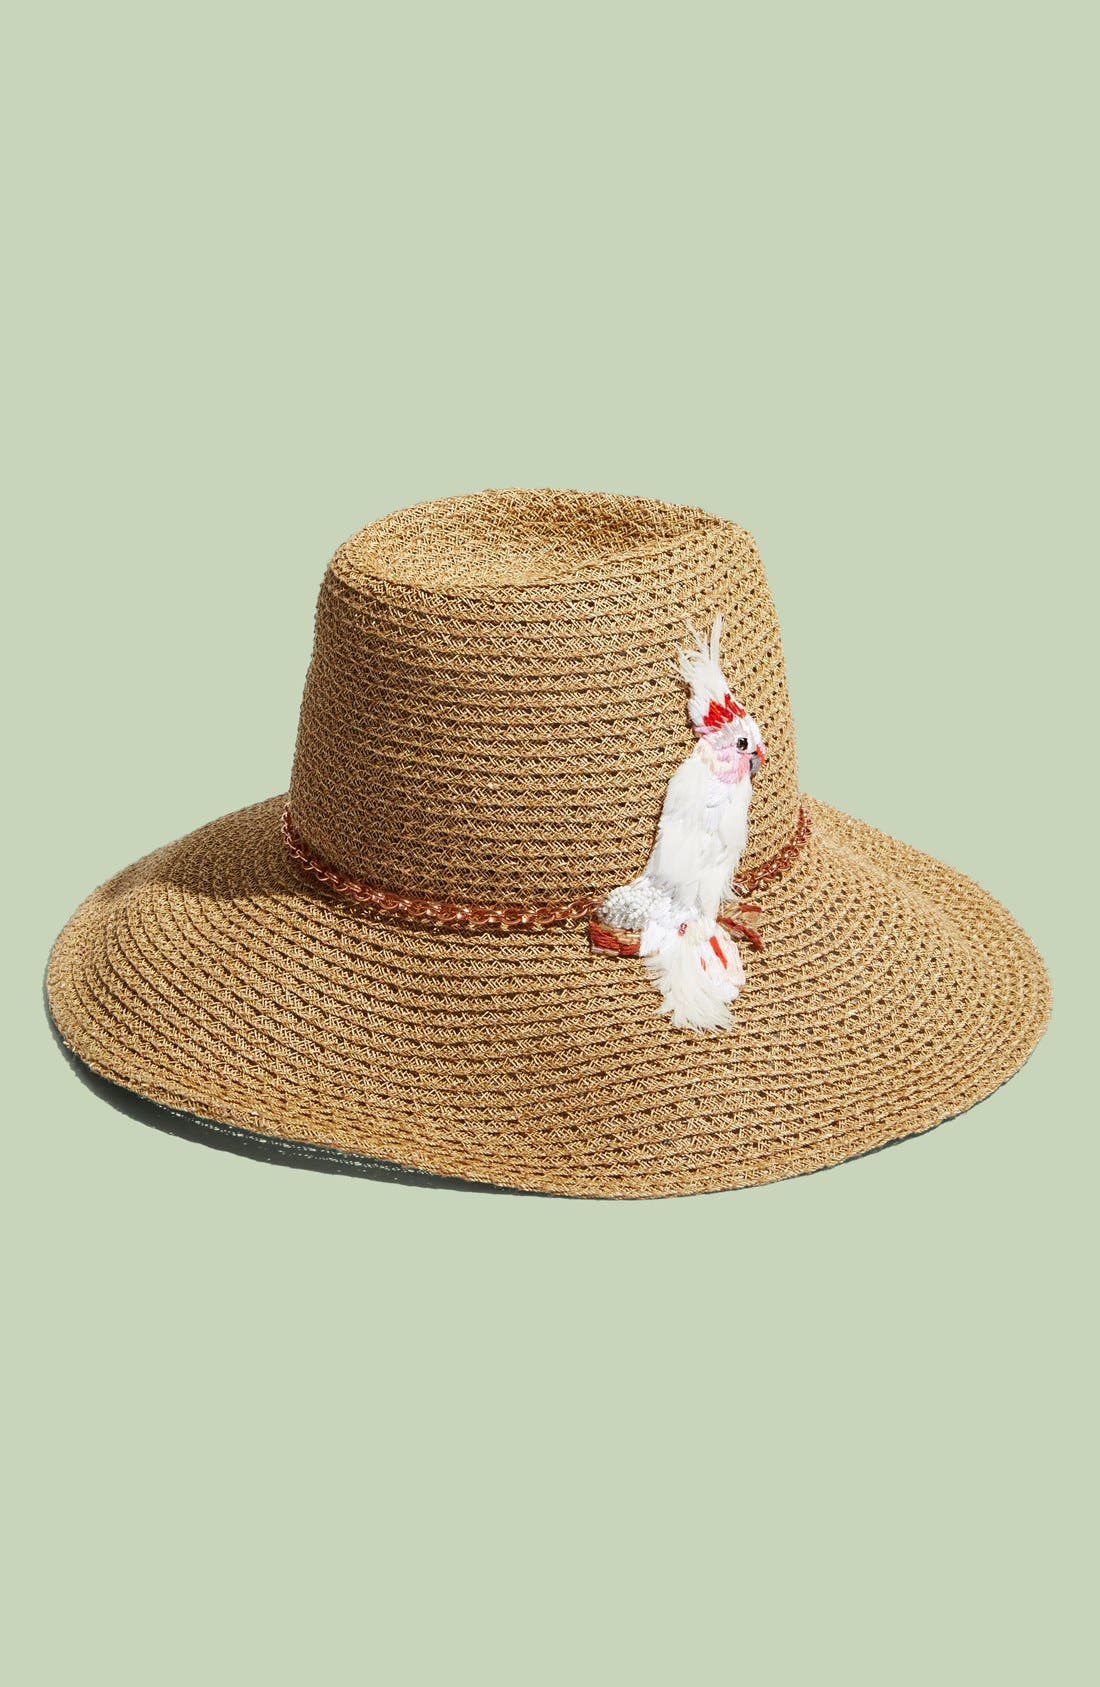 'Emmanuelle' Cockatoo Ornament Straw Hat,                         Main,                         color, Camel